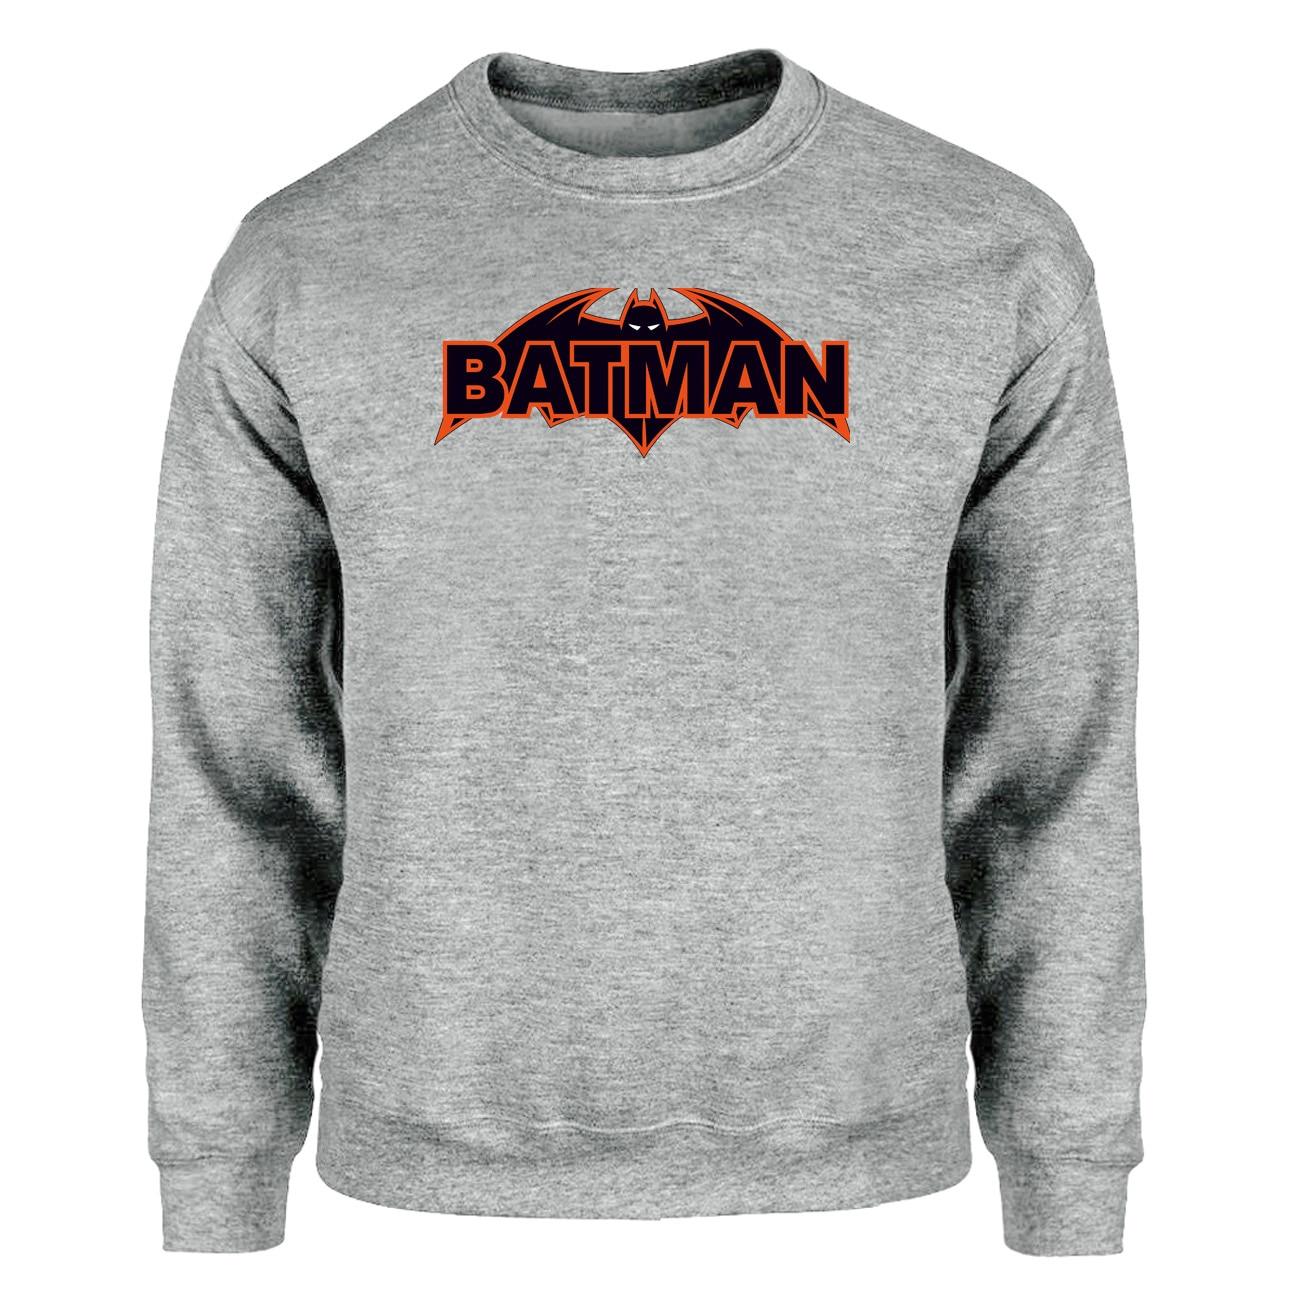 All Over Shirts Bruce Wayne Sweatshirt